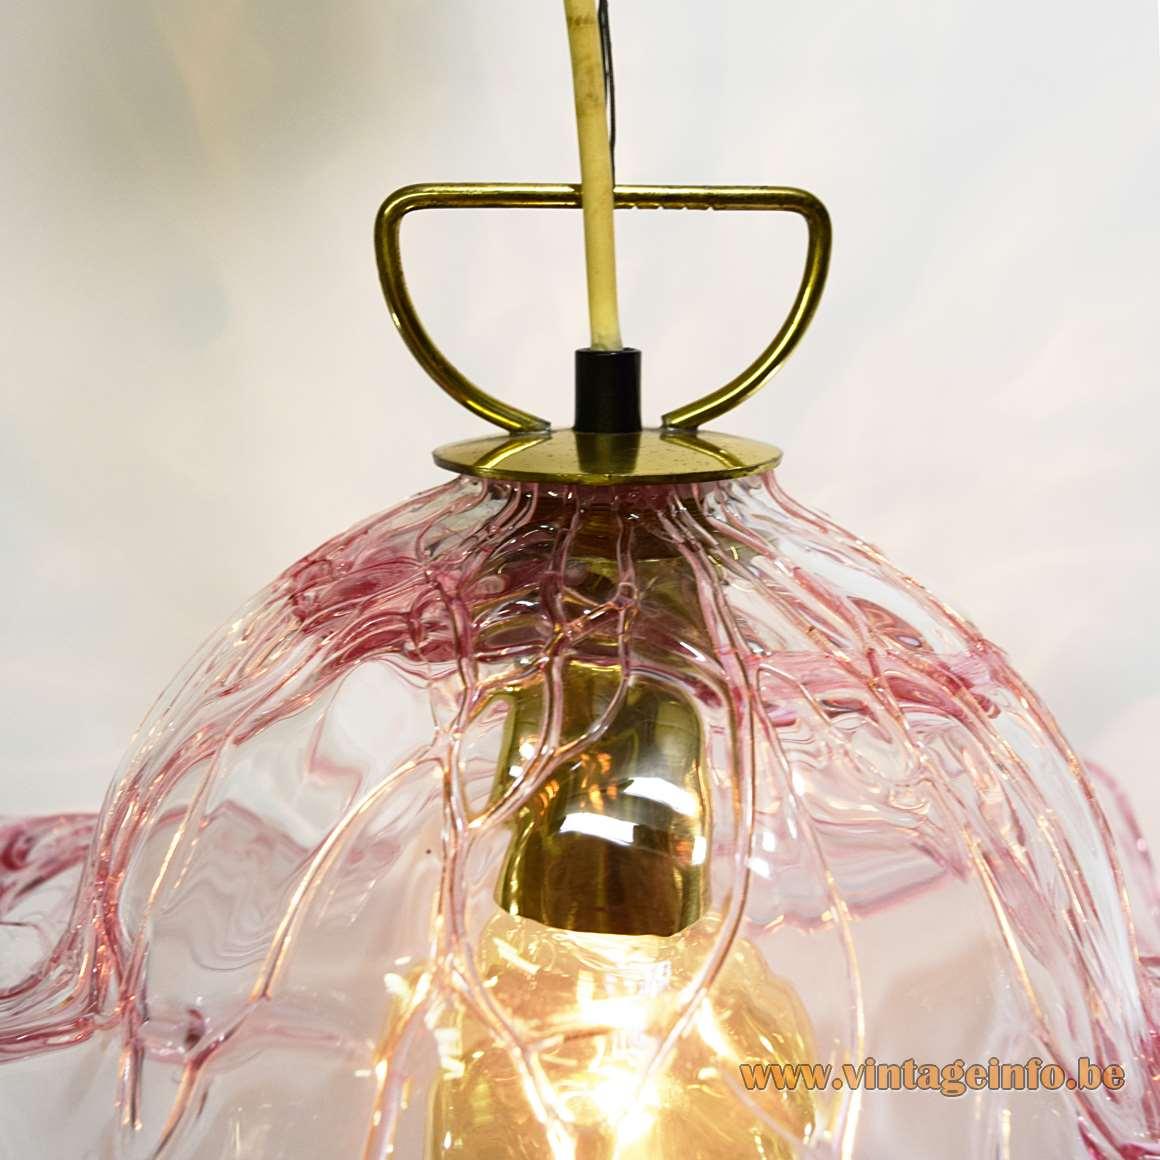 Pink Veined Murano Pendant Lamp translucent hand blown glass 1960s 1970s Kalmar Franken Austria MCM